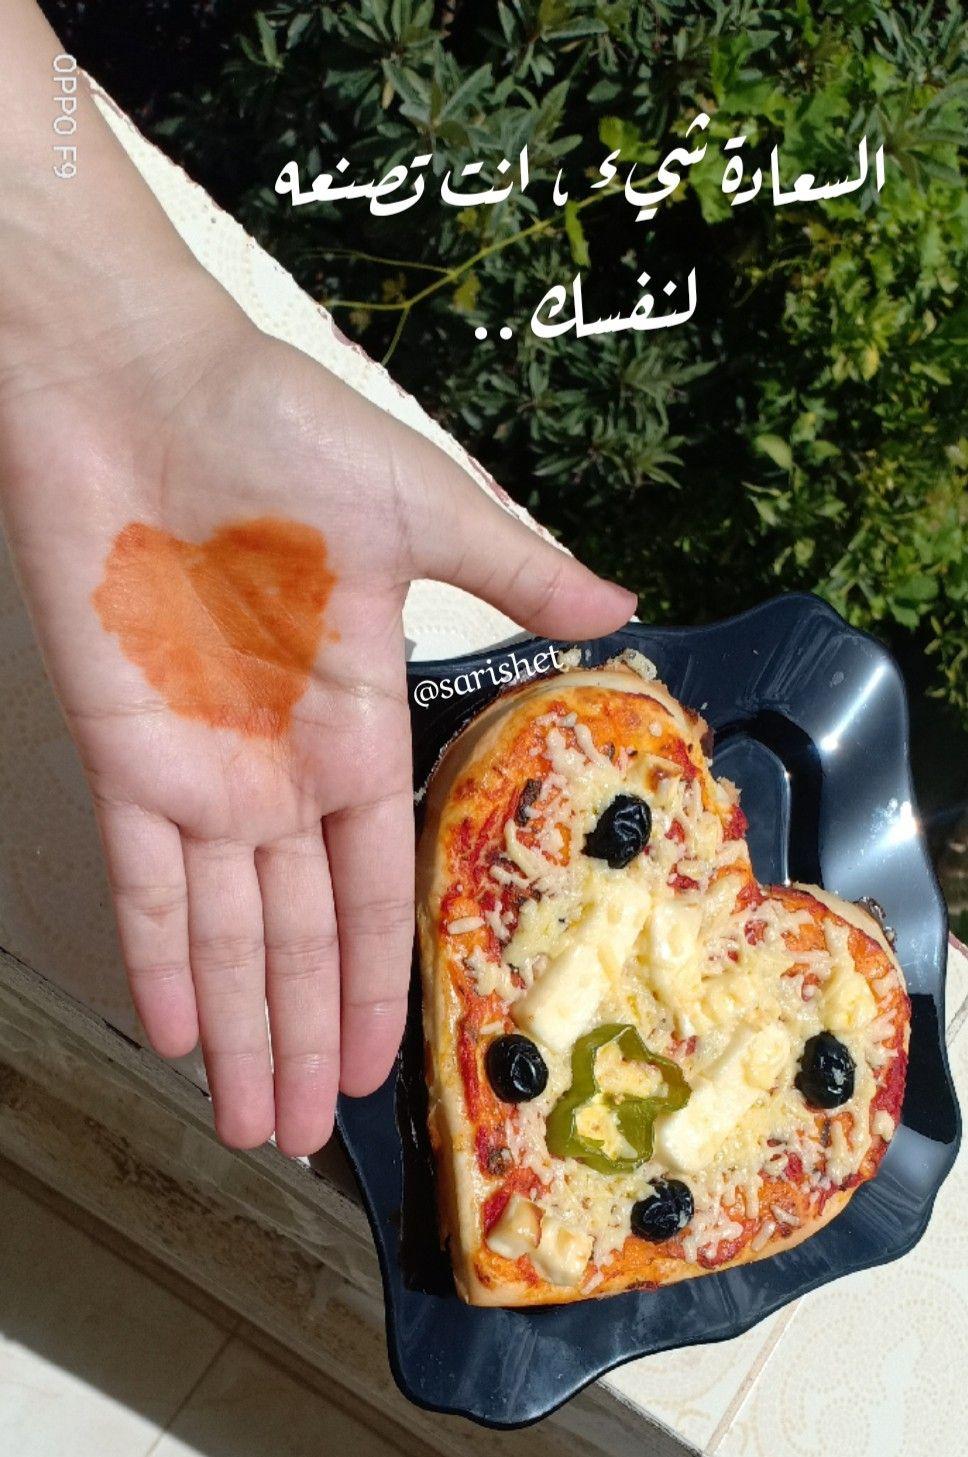 بيتزا ورد حب اقتباسات Food Vegetable Pizza Vegetables